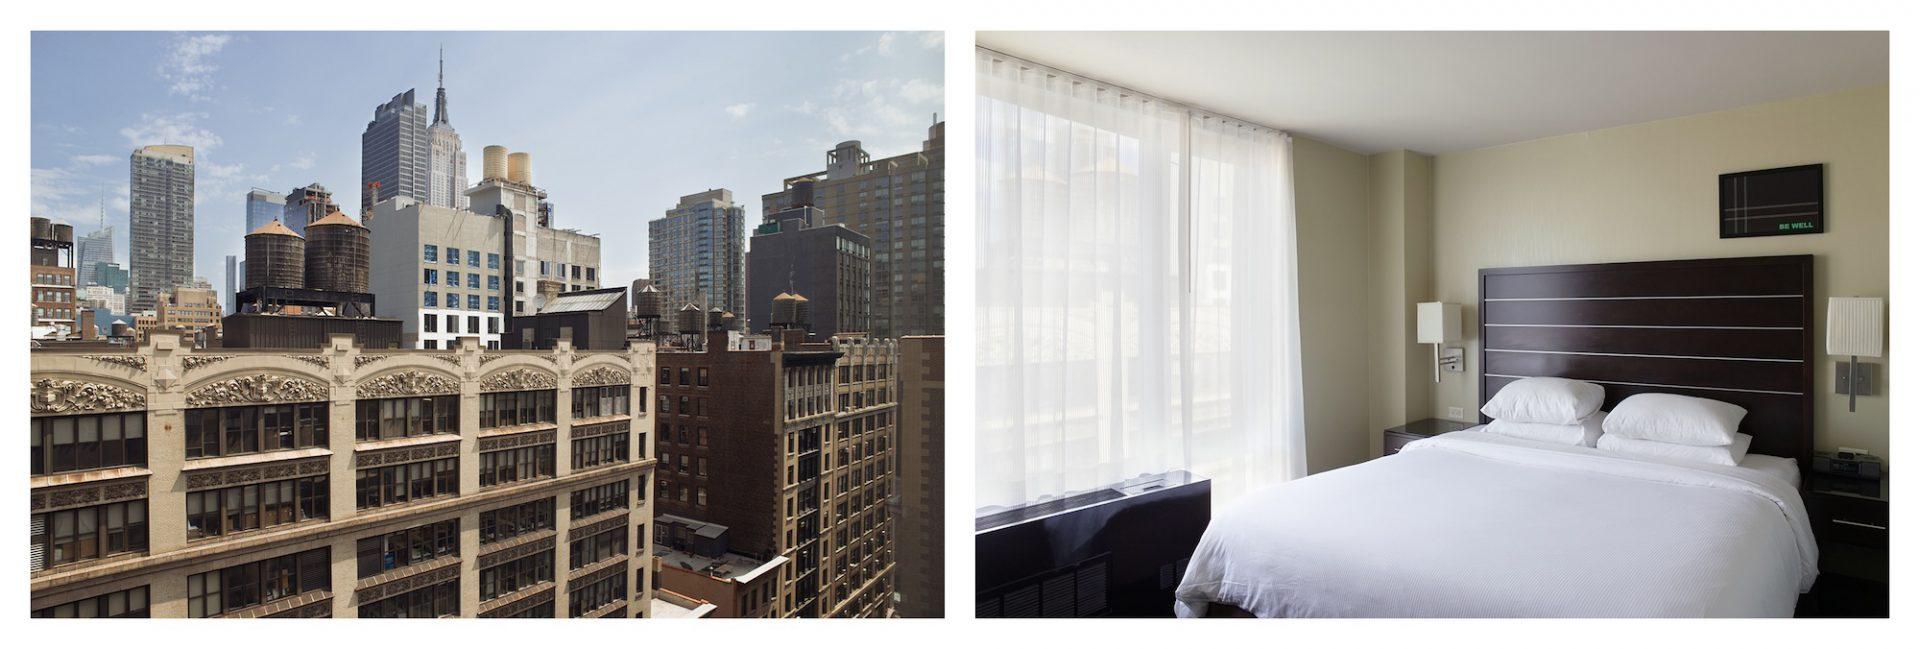 Seite 30-31.  31.07.2015, New York, Room 1808